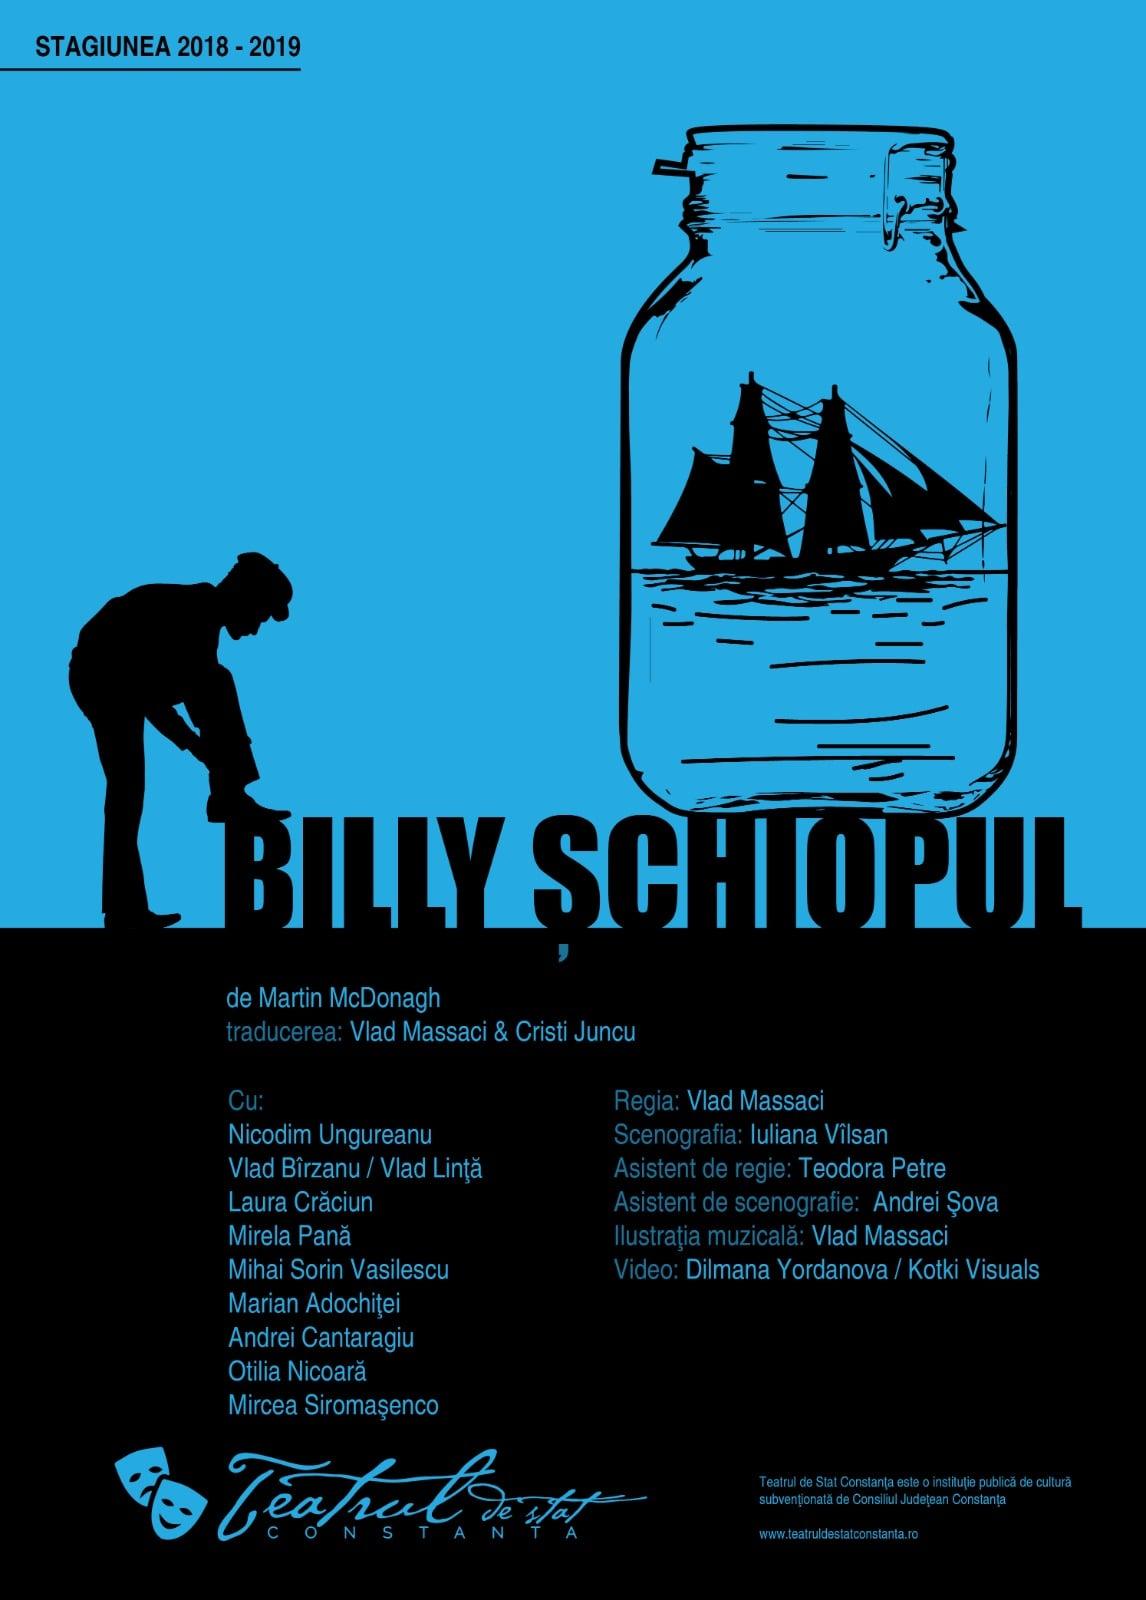 BILLY ȘCHIOPUL de Martin McDonagh